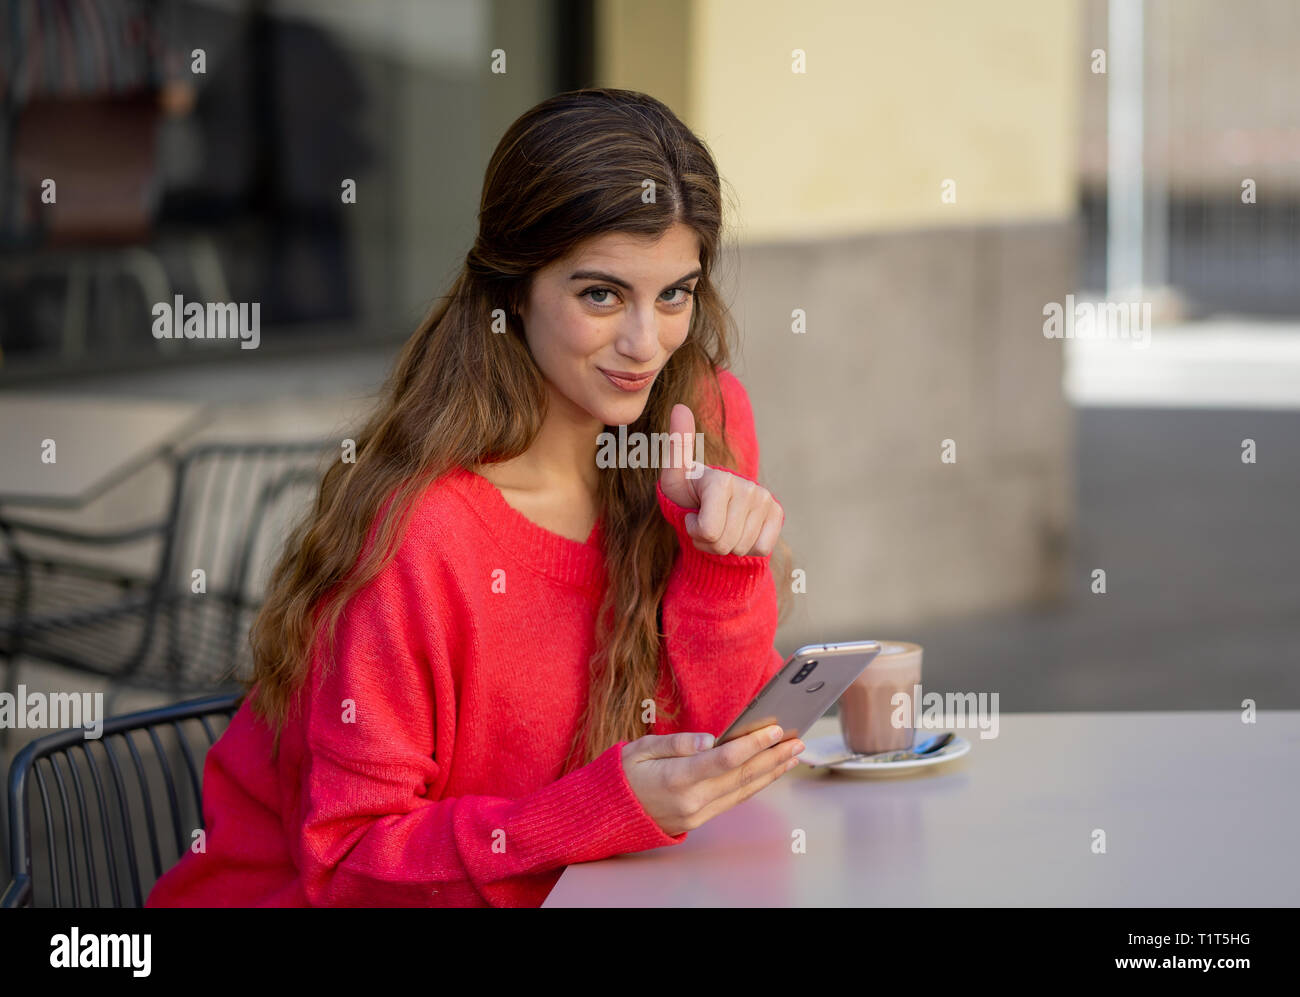 urban online dating sites match.com speed dating anmeldelser